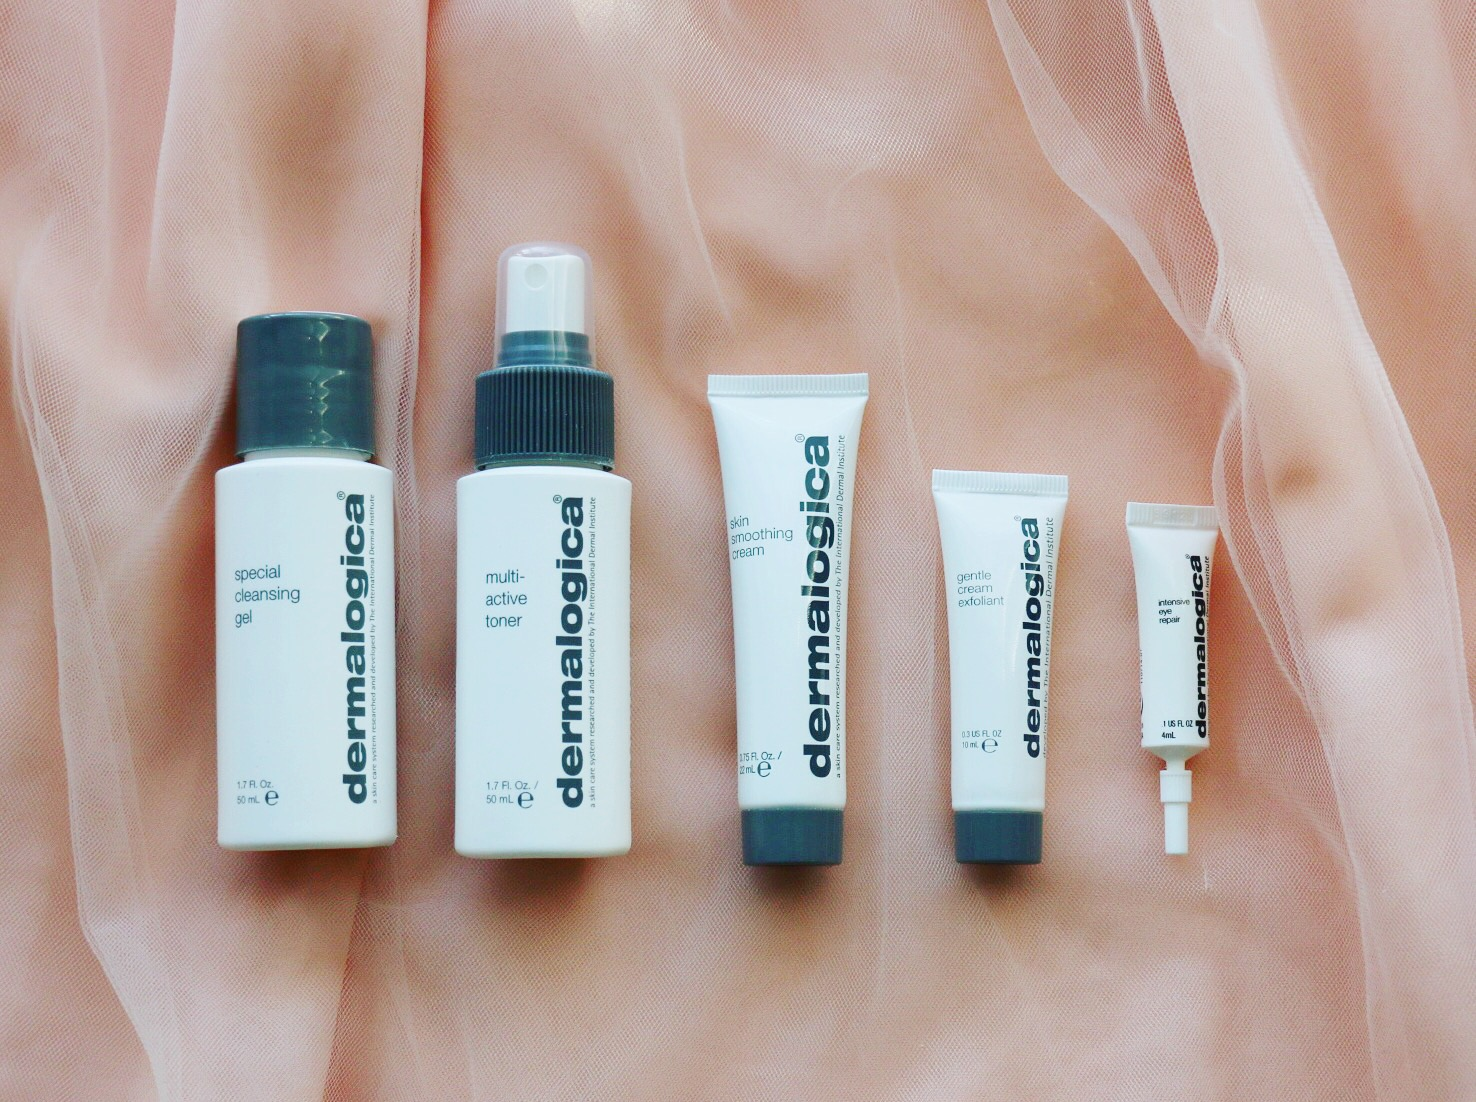 dermalogica skincare set for normal to dry skin.